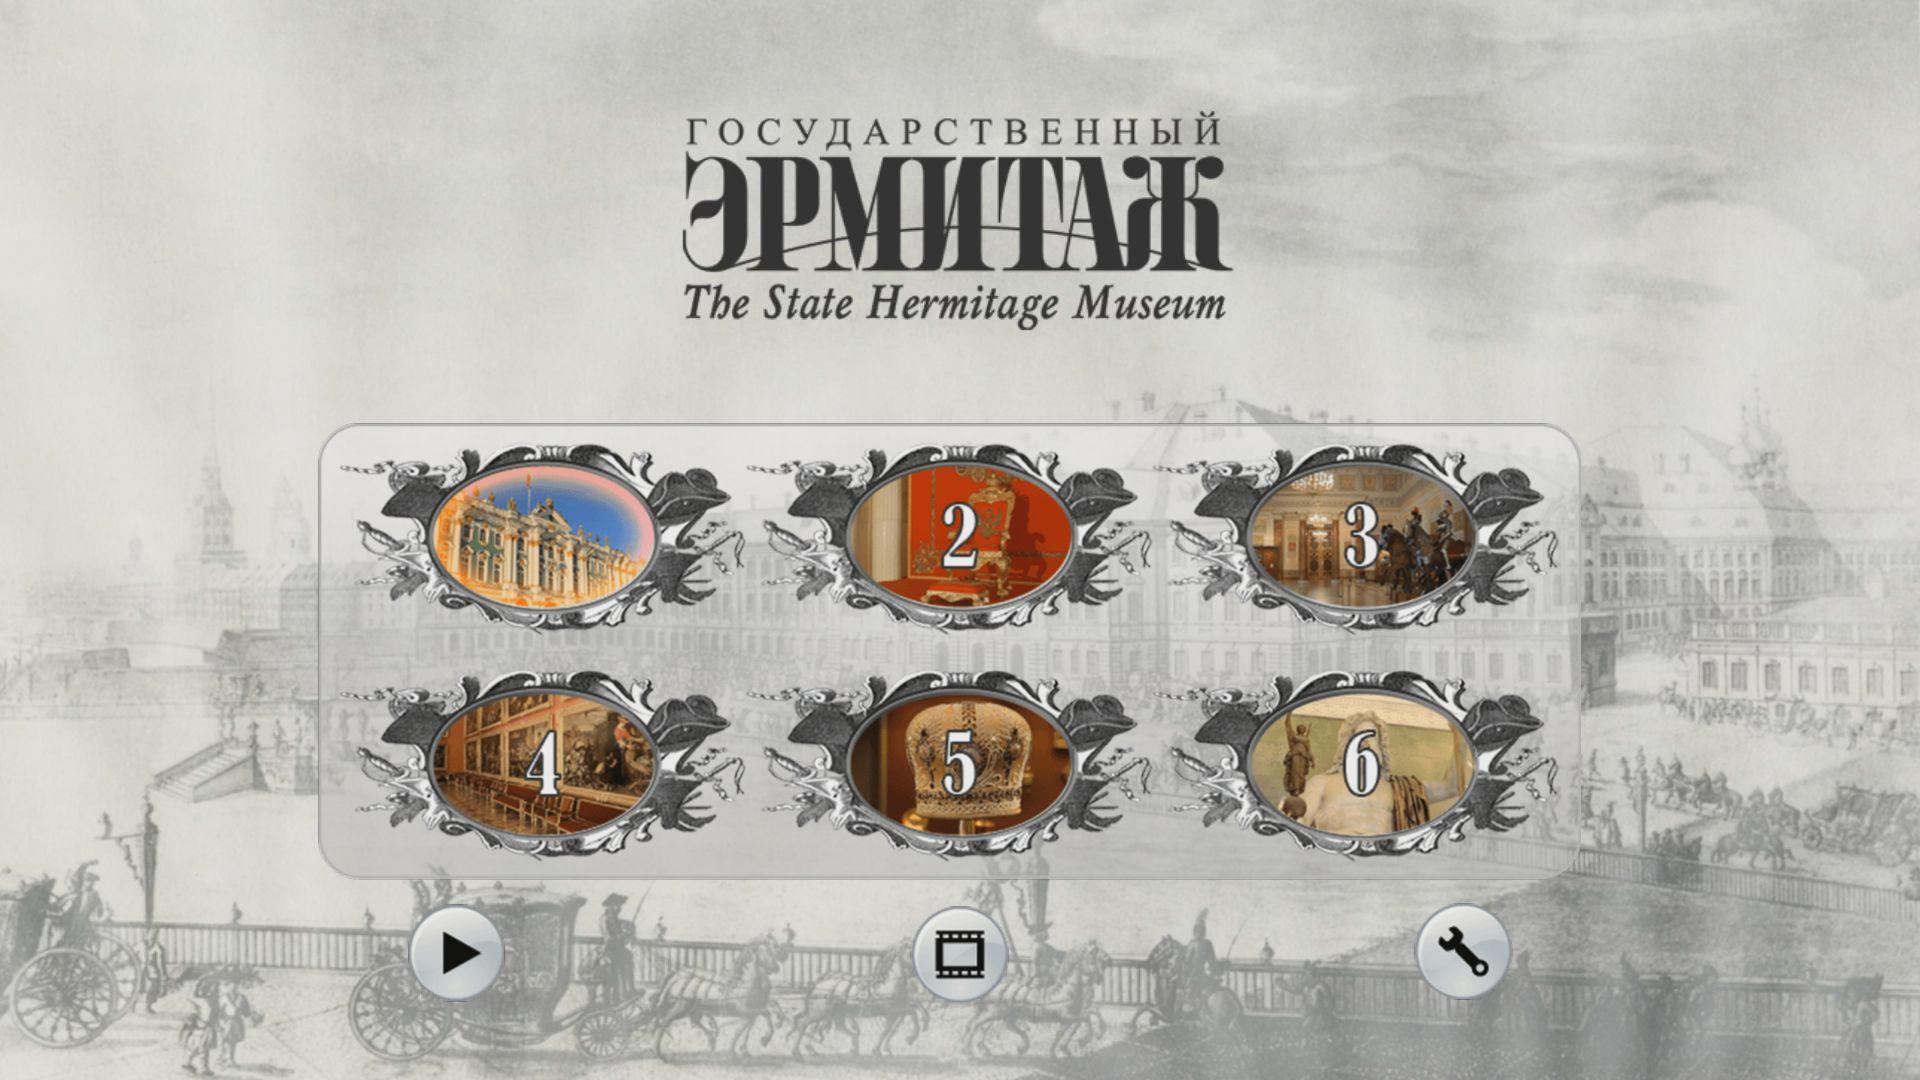 http://i2.imageban.ru/out/2012/04/02/5214a6a021a9cf14697ce09185bc5ac6.jpg